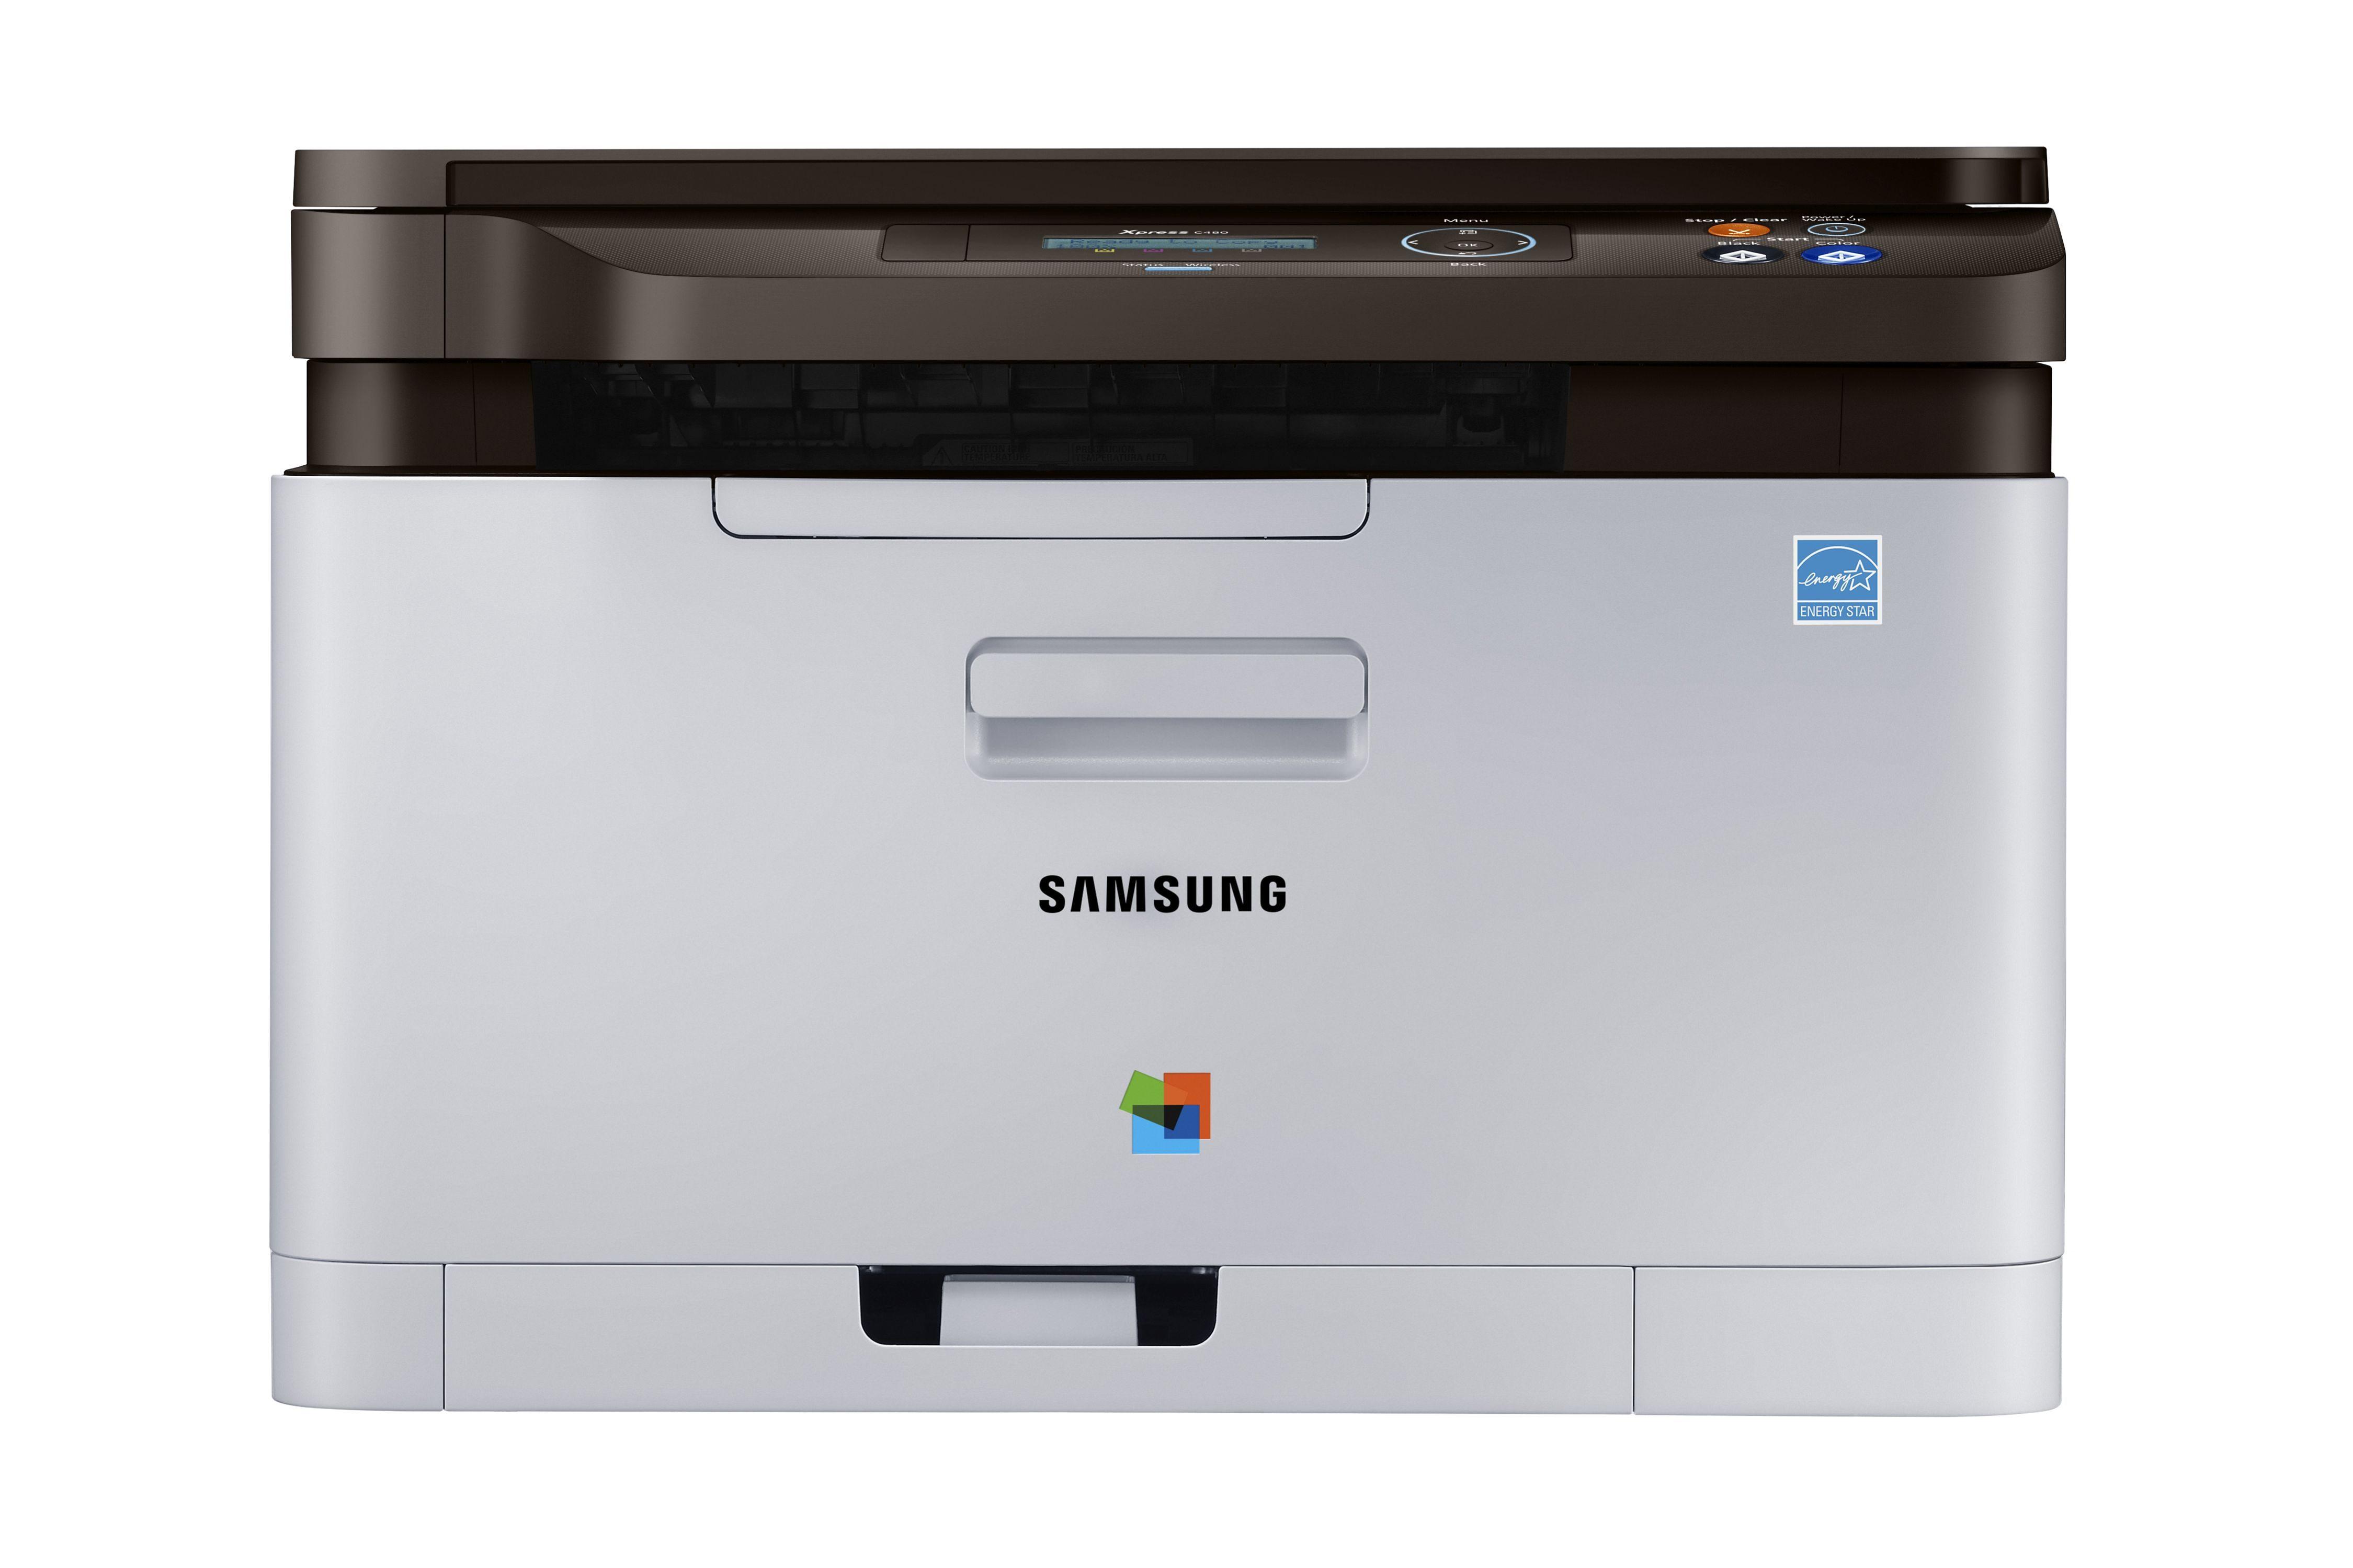 Samsung Farblaser-Drucker »SL-C480/TEG Color Laser MFP (SL-C480/TEG)«